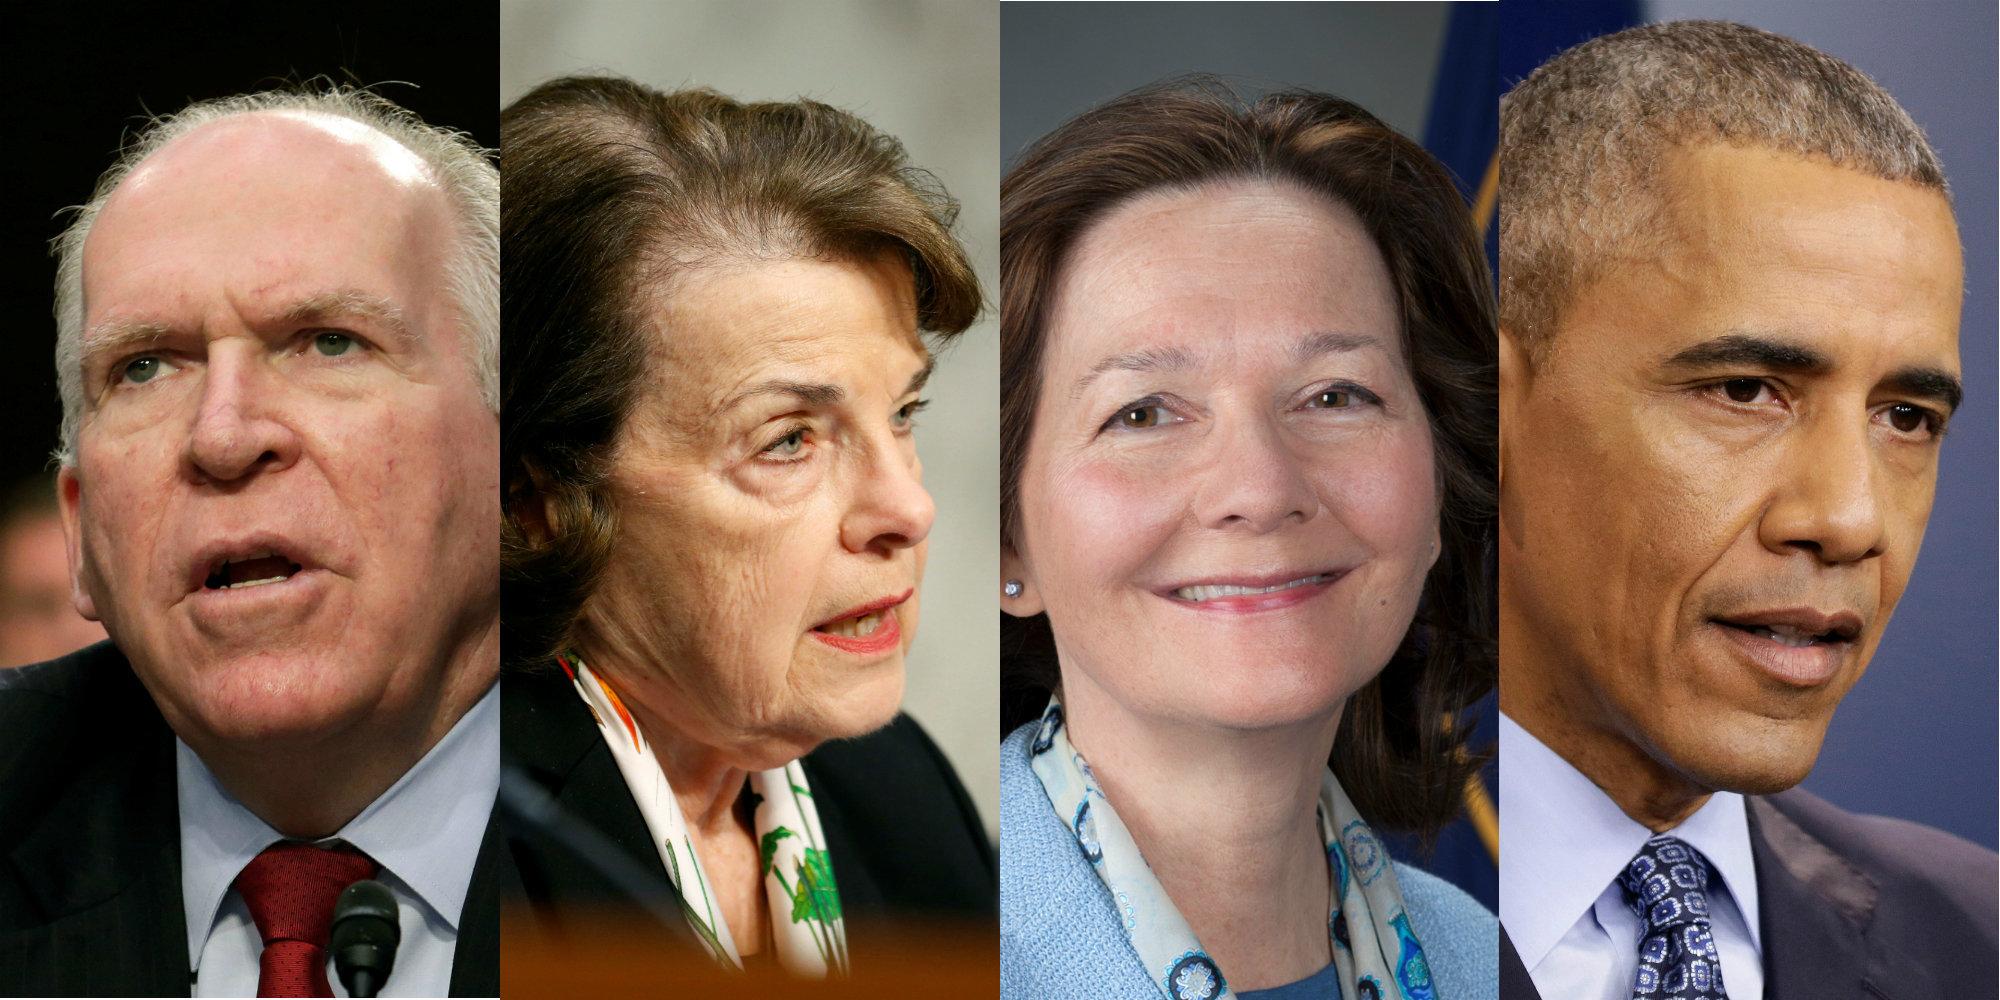 Former CIA Director John Brennan, Senator Dianne Feinstein, CIA Deputy Director Gina Haspel and President Barack Obama.